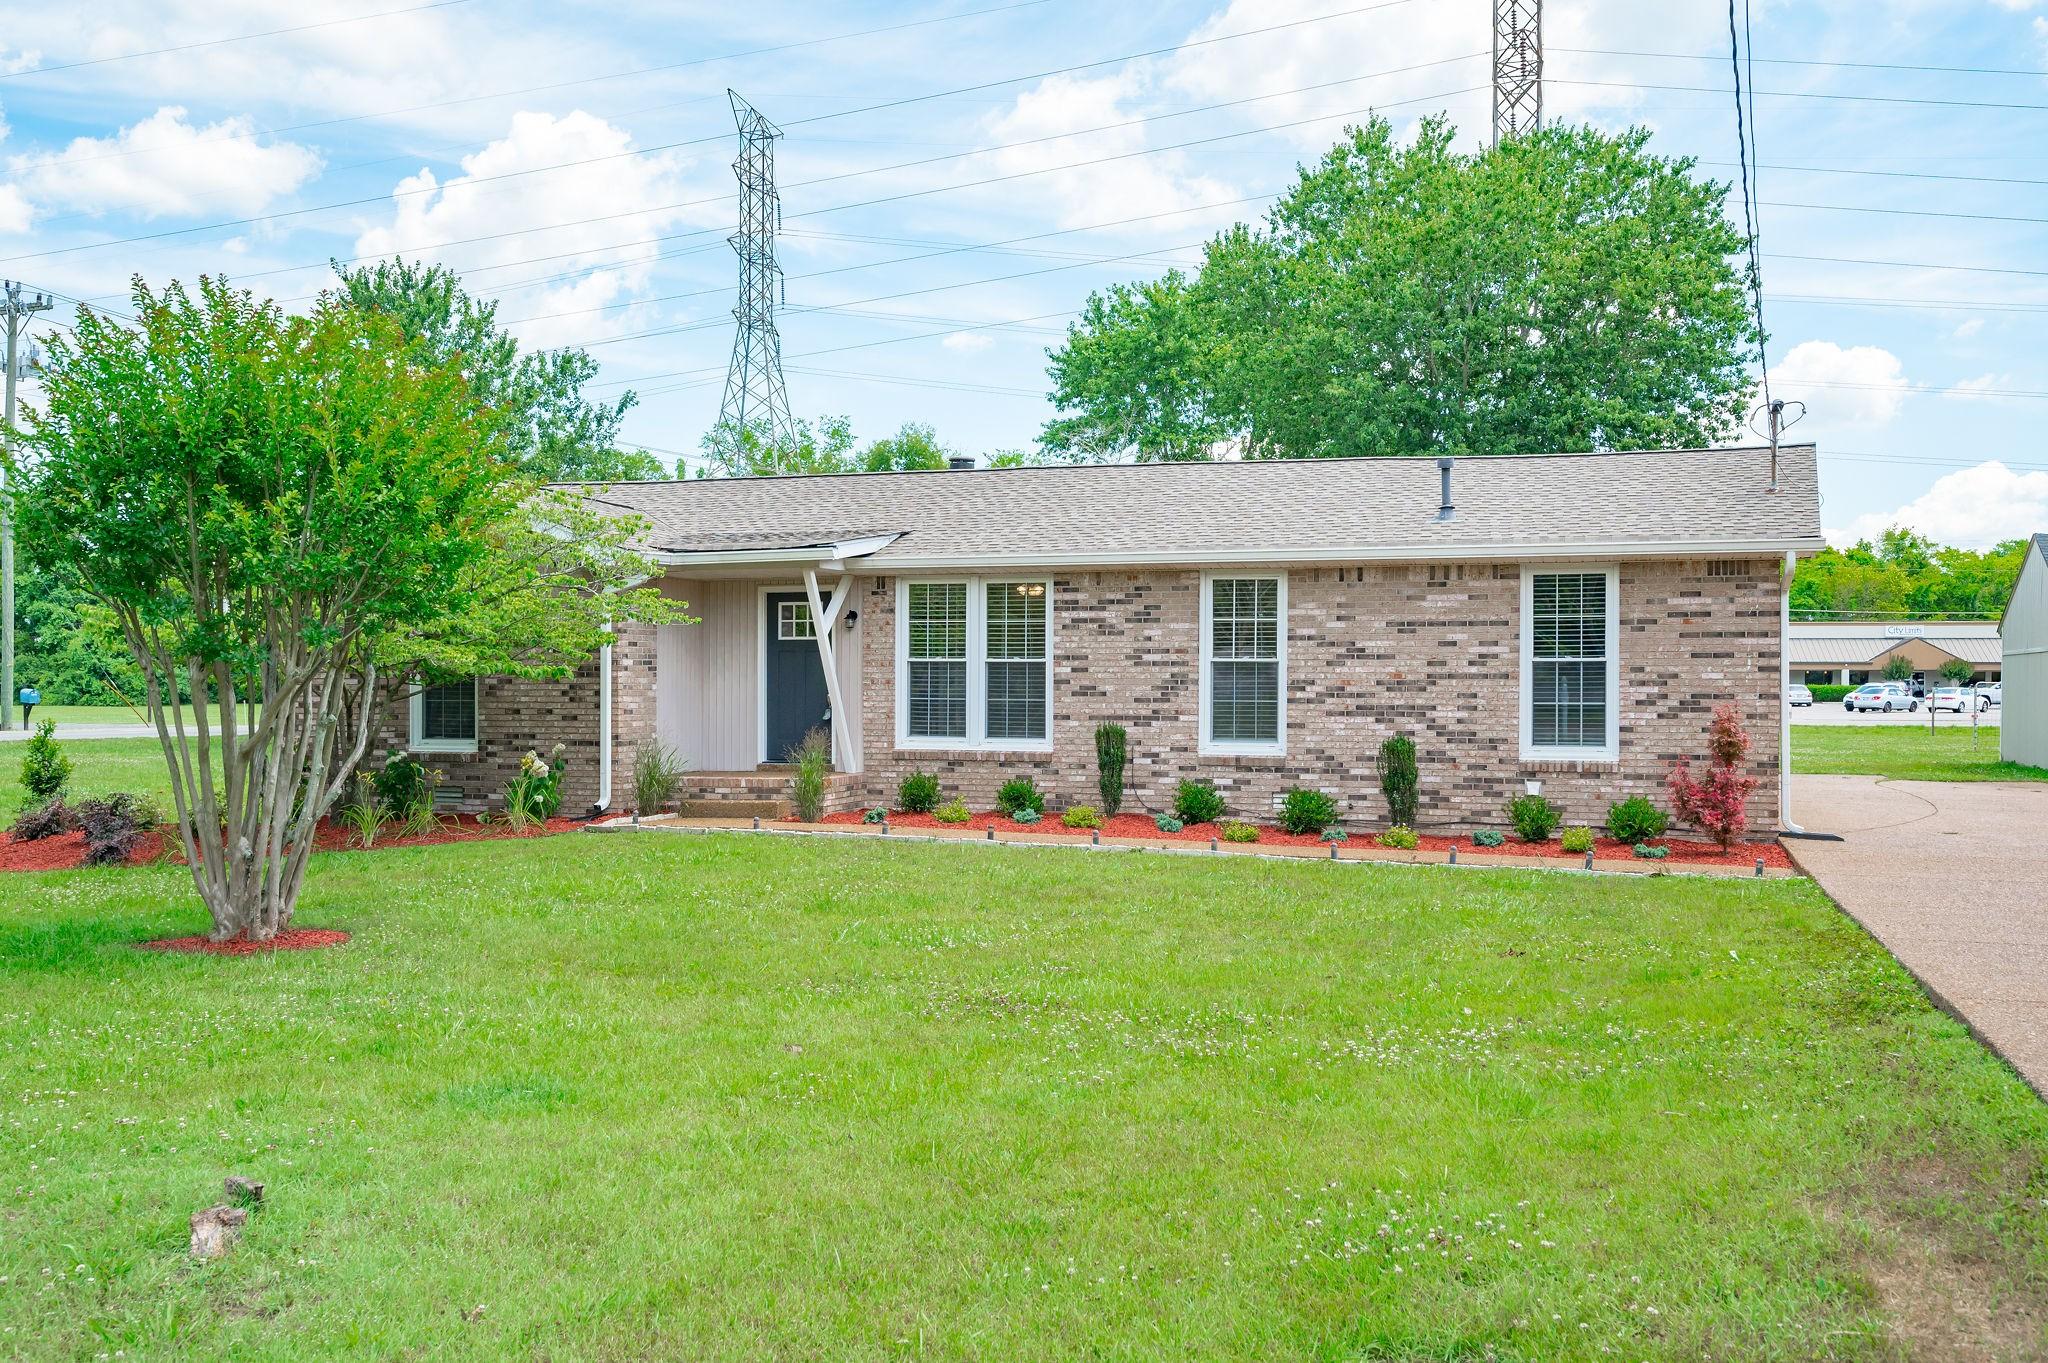 760 Harpeth Pkwy, W Property Photo - Nashville, TN real estate listing